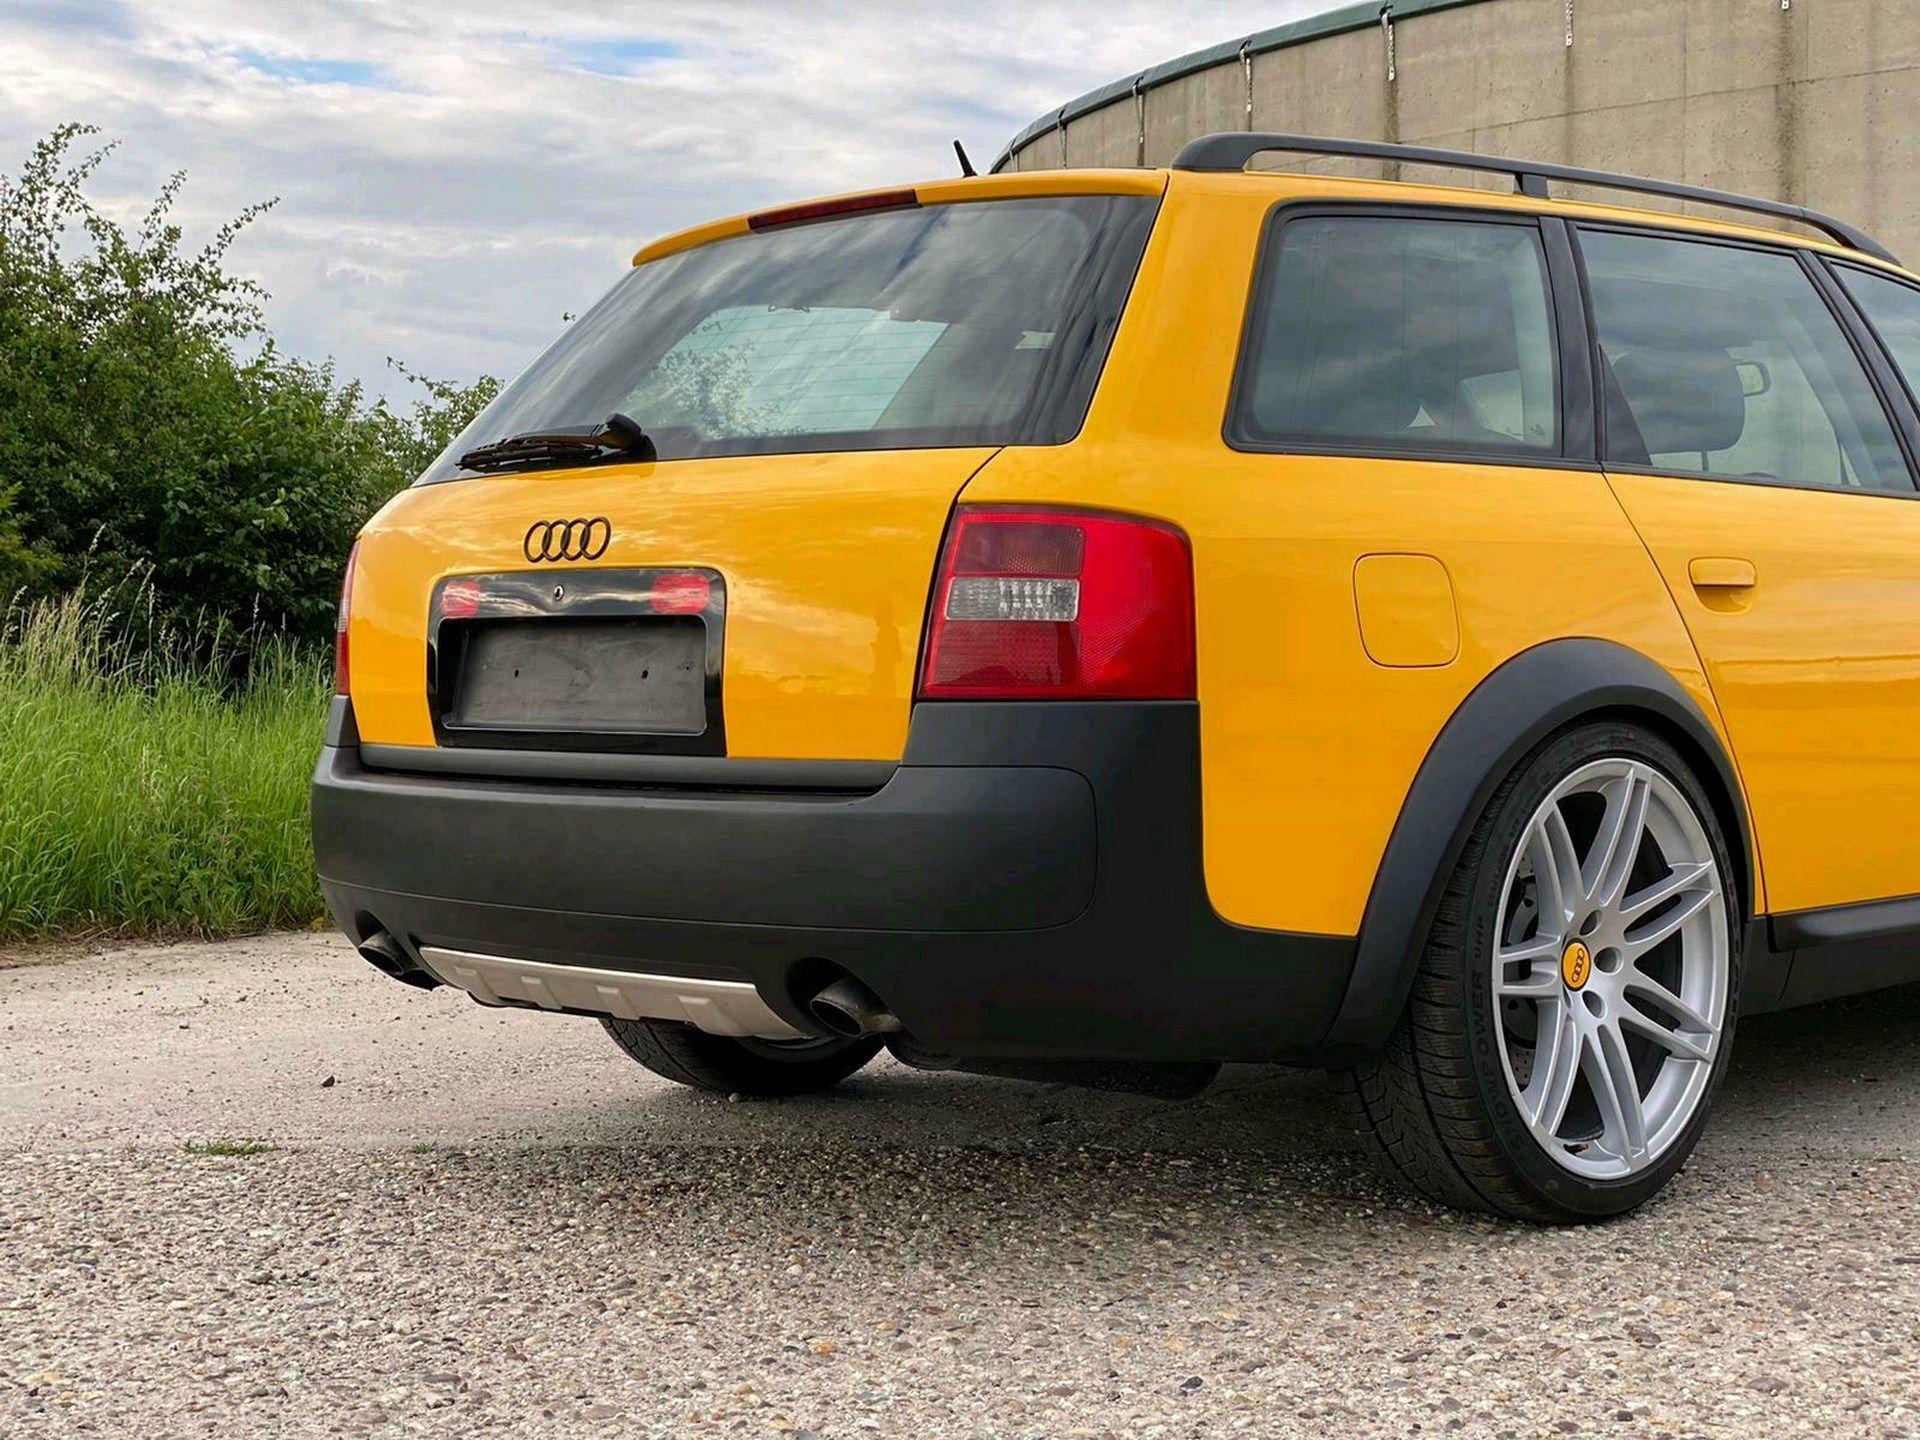 Audi-RS6-Allroad-Custom-Build-3.jpg